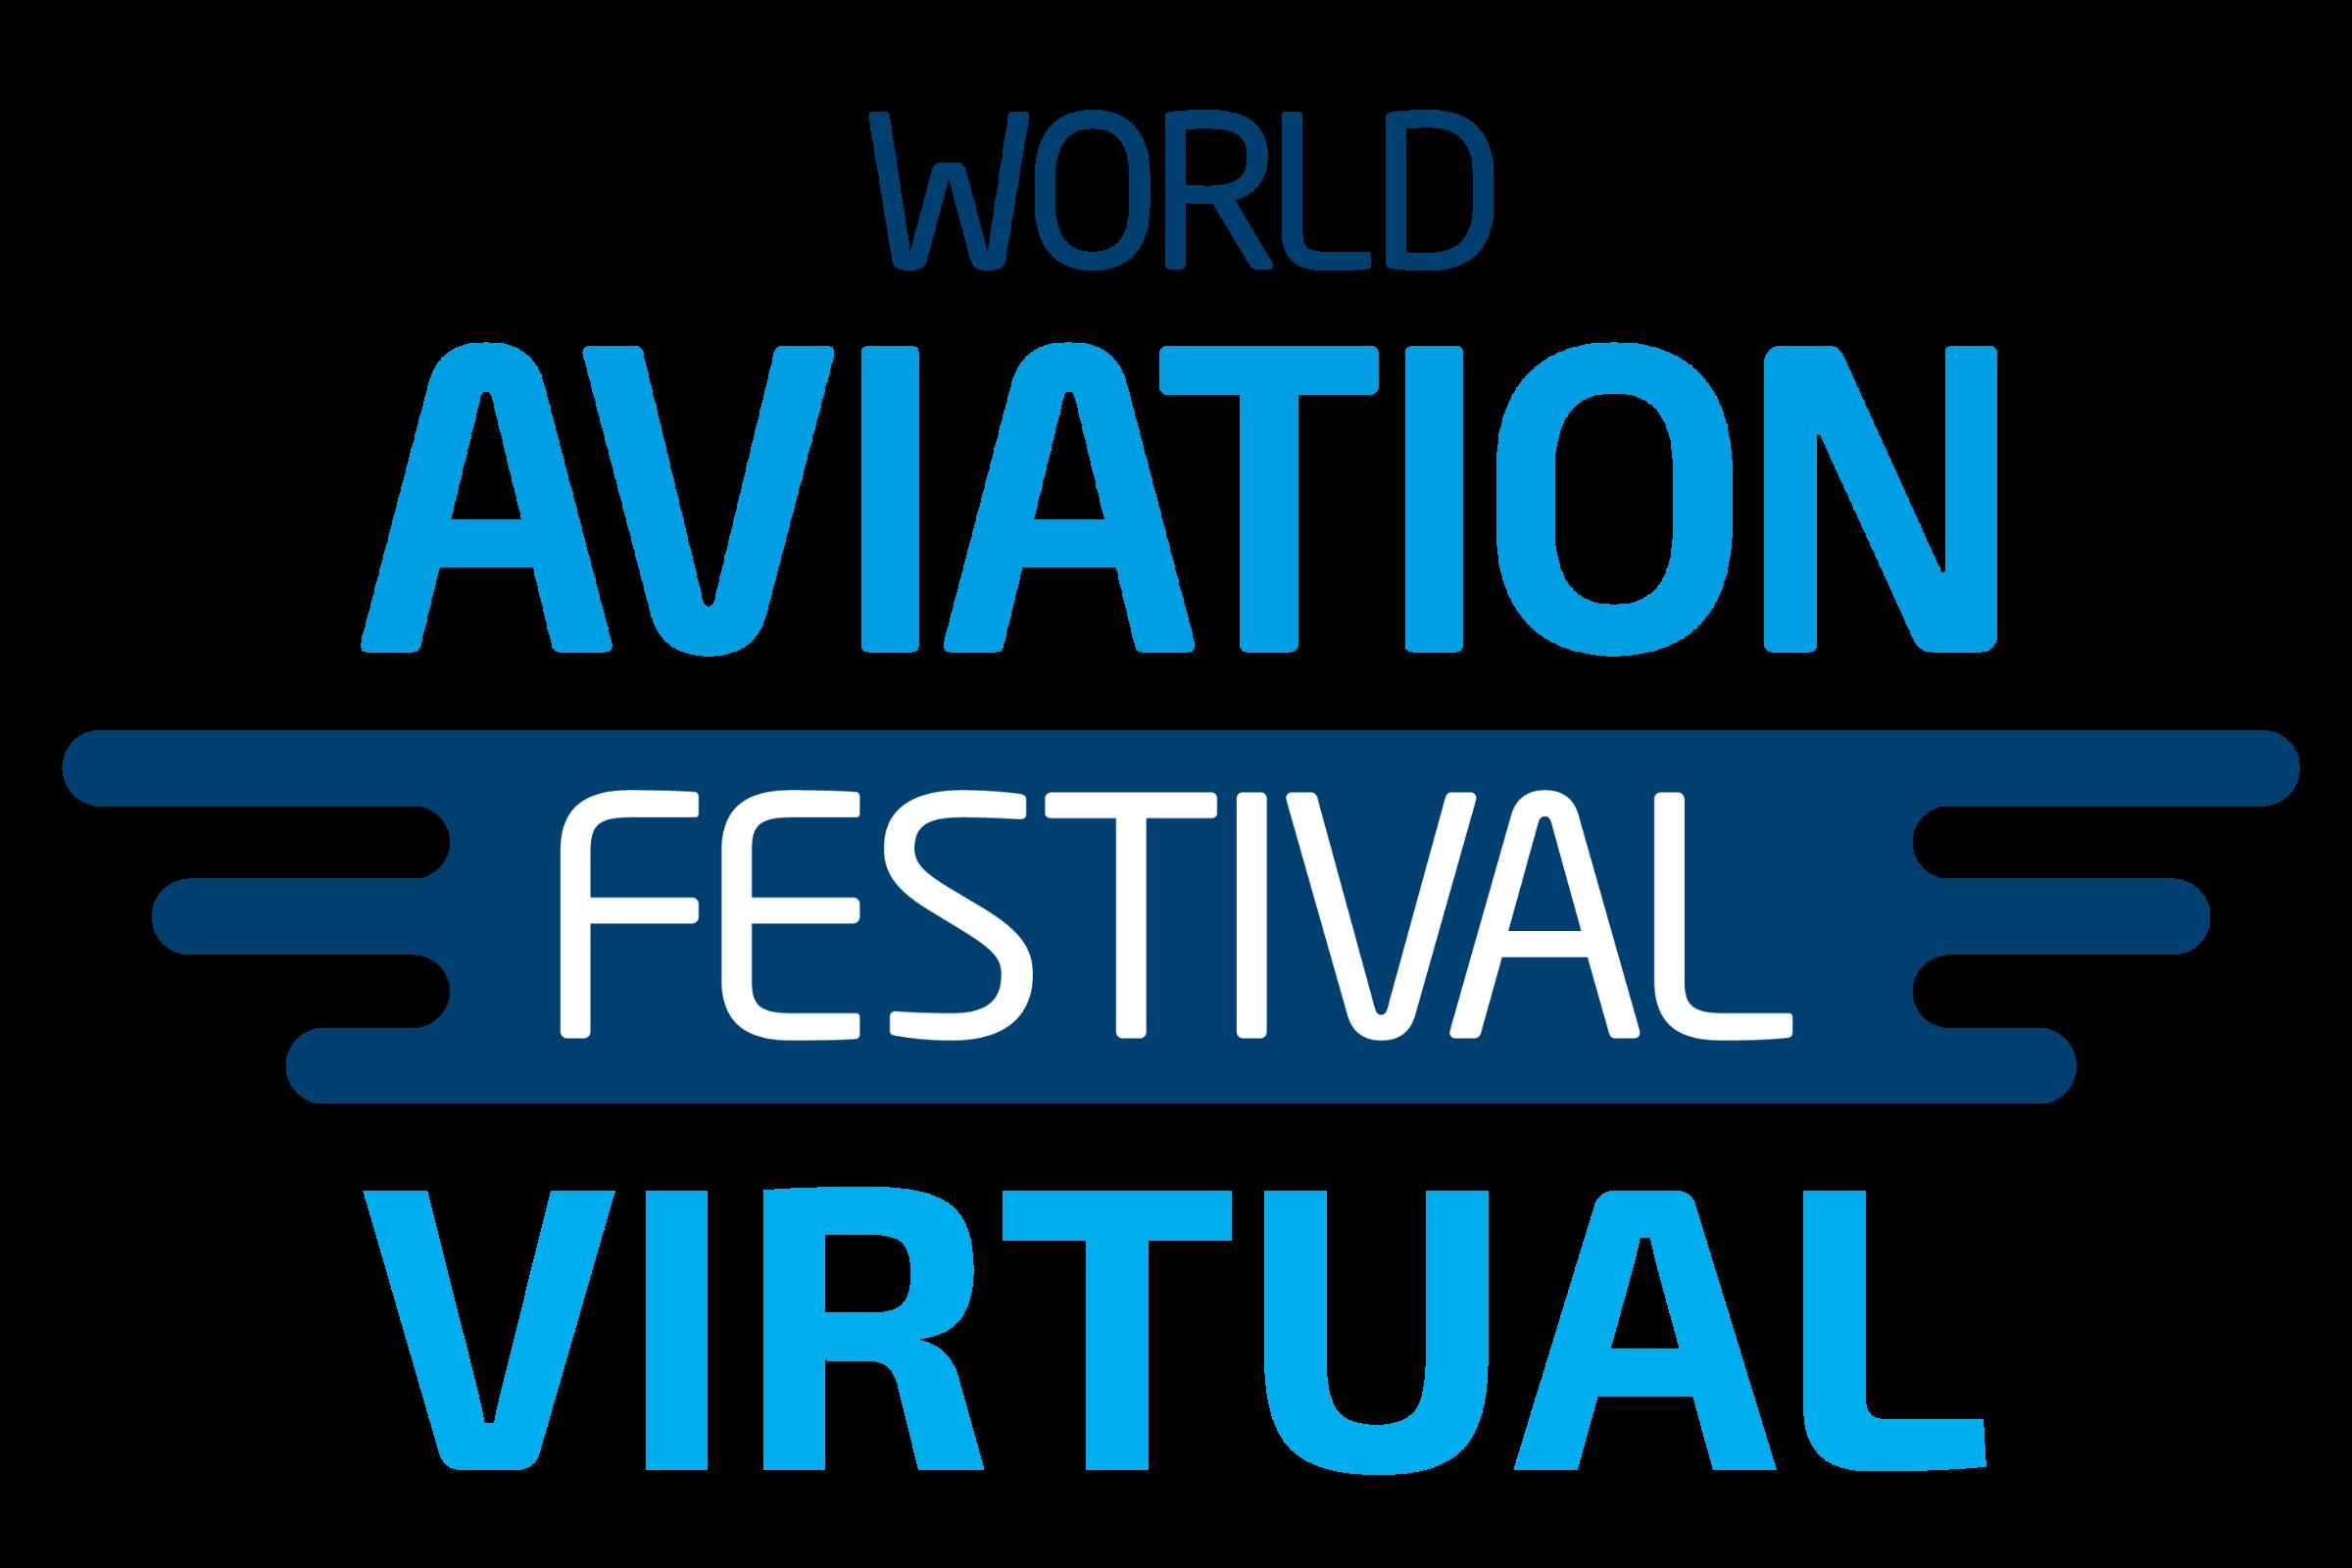 alt='World Aviation Festival Virtual'  Title='World Aviation Festival Virtual'